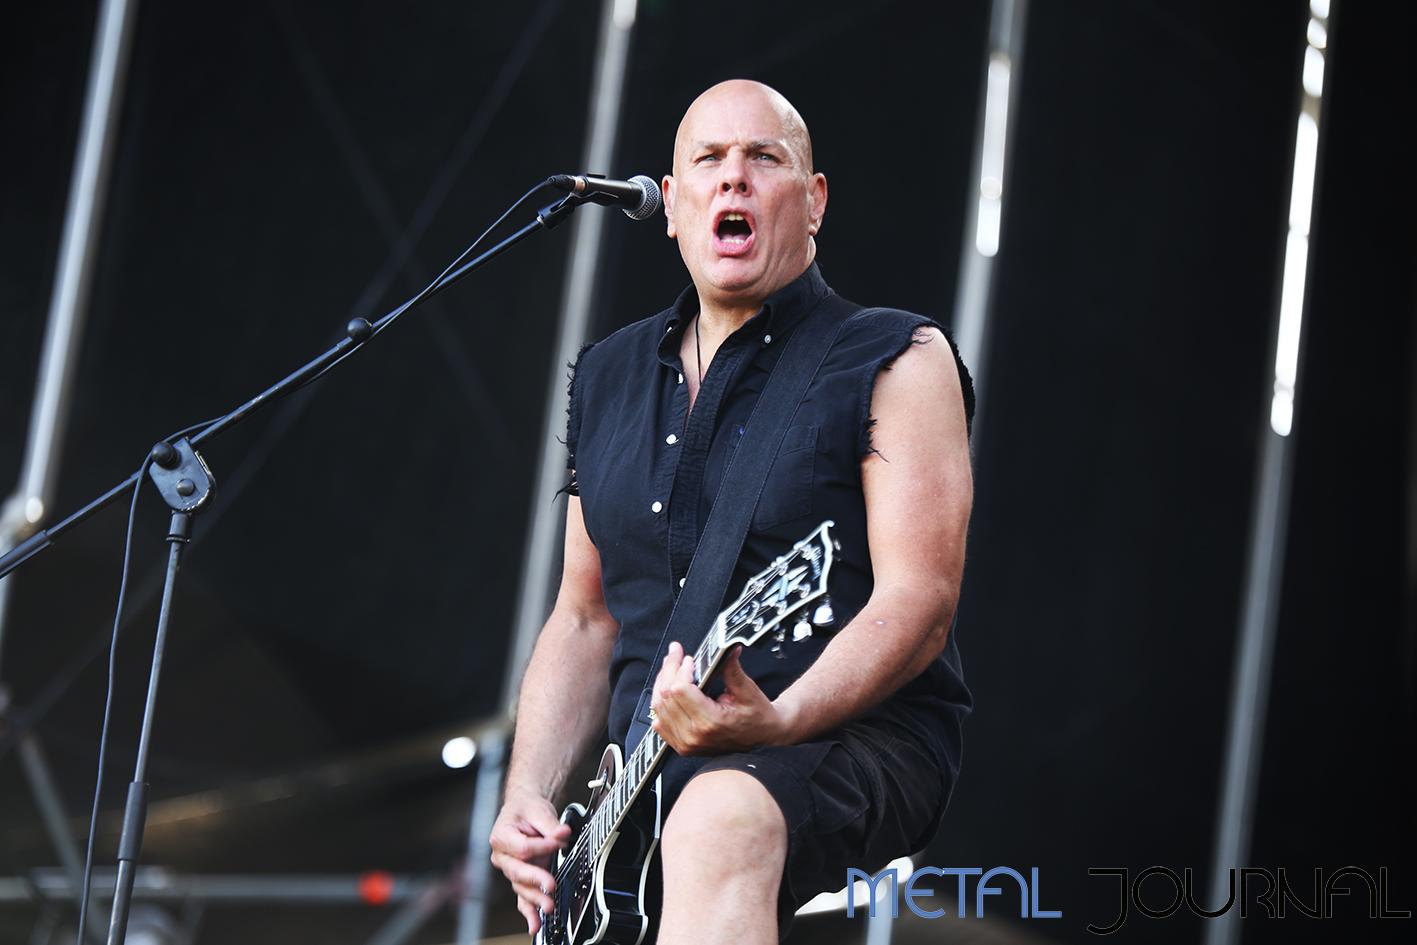 metal church - leyendas del rock 2019 metal journal pic 4